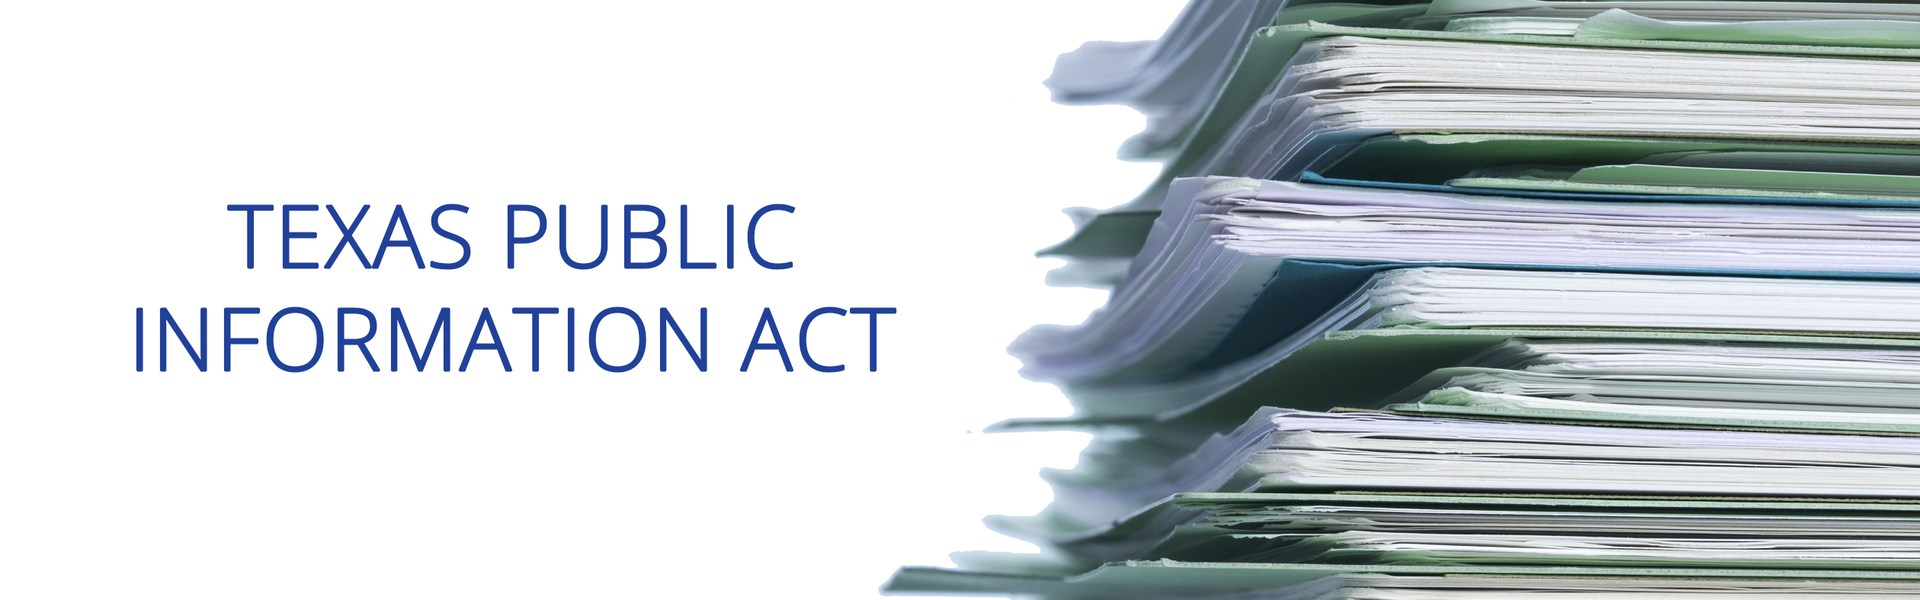 Texas Public Information Act